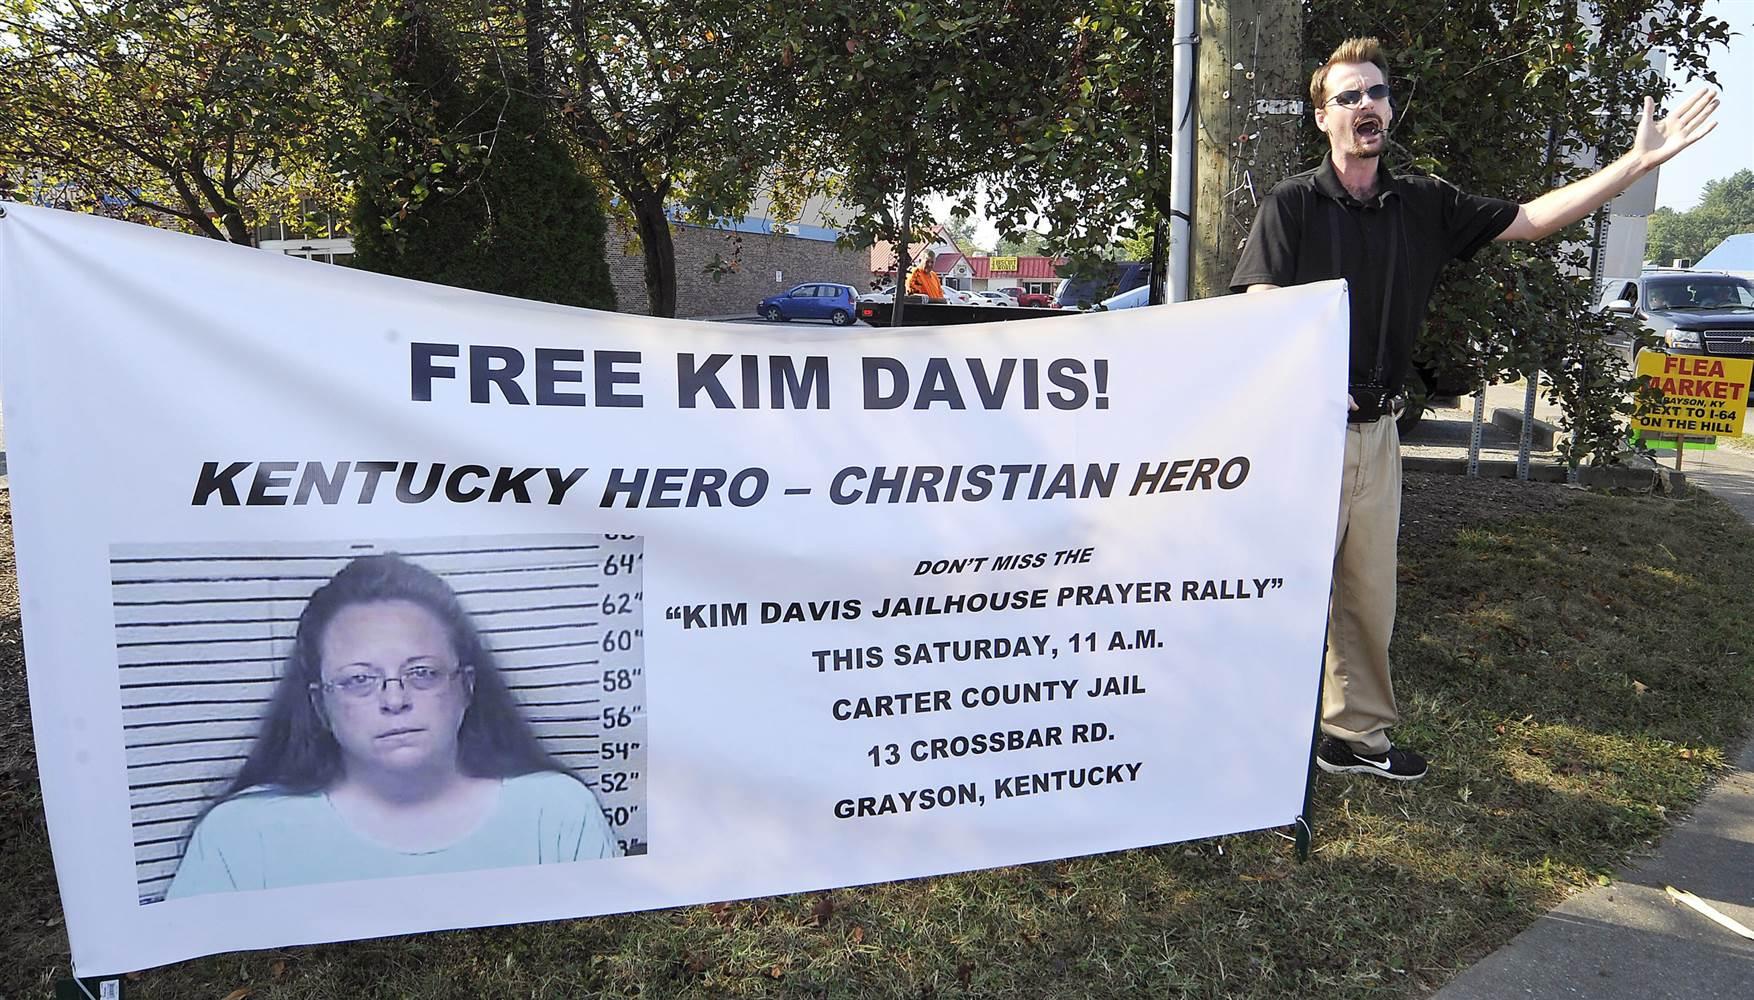 Cringeworthy banner kim davis marriage license controversy lea rket tto 1 64 on the h kentucky hero aiddatafo Choice Image